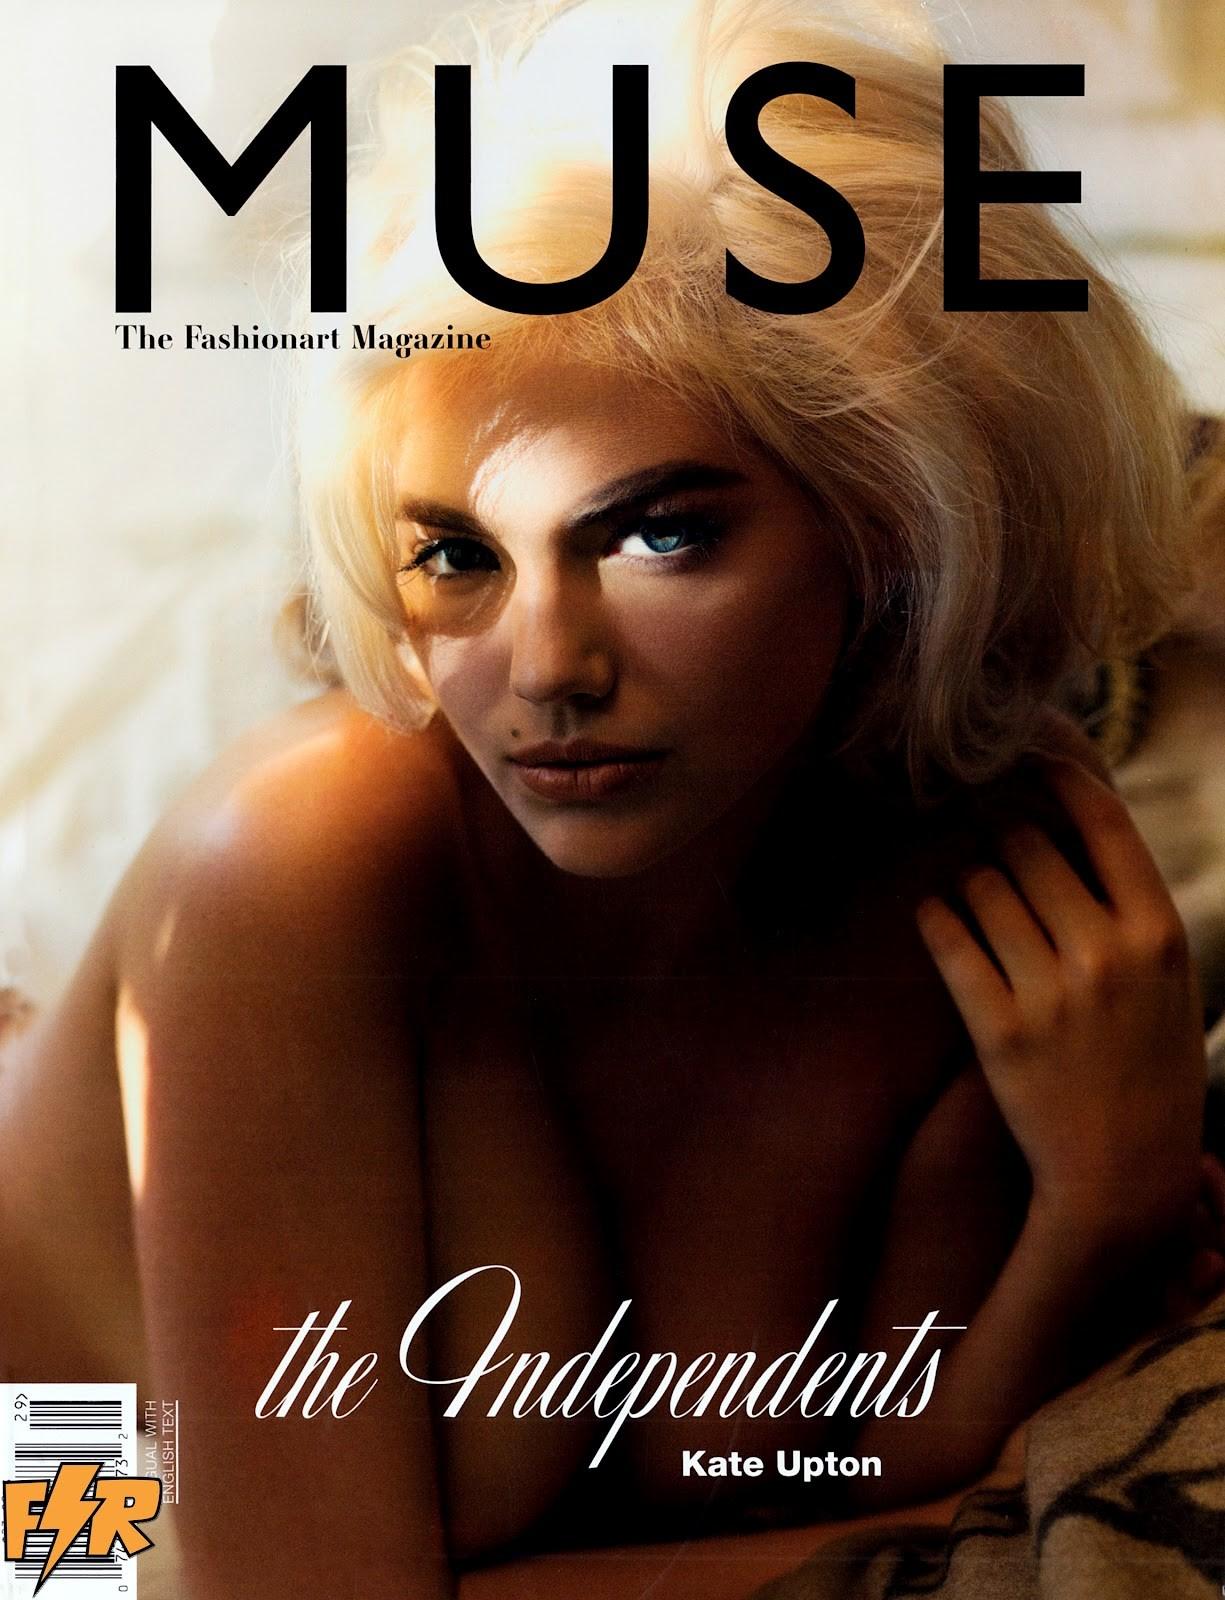 http://4.bp.blogspot.com/-6tjtw2R6H1g/T5lQngHndVI/AAAAAAAACNE/UVgQgm9Aago/s1600/Kate-Upton-Muse-Magazine-Italy-2012-01.jpg